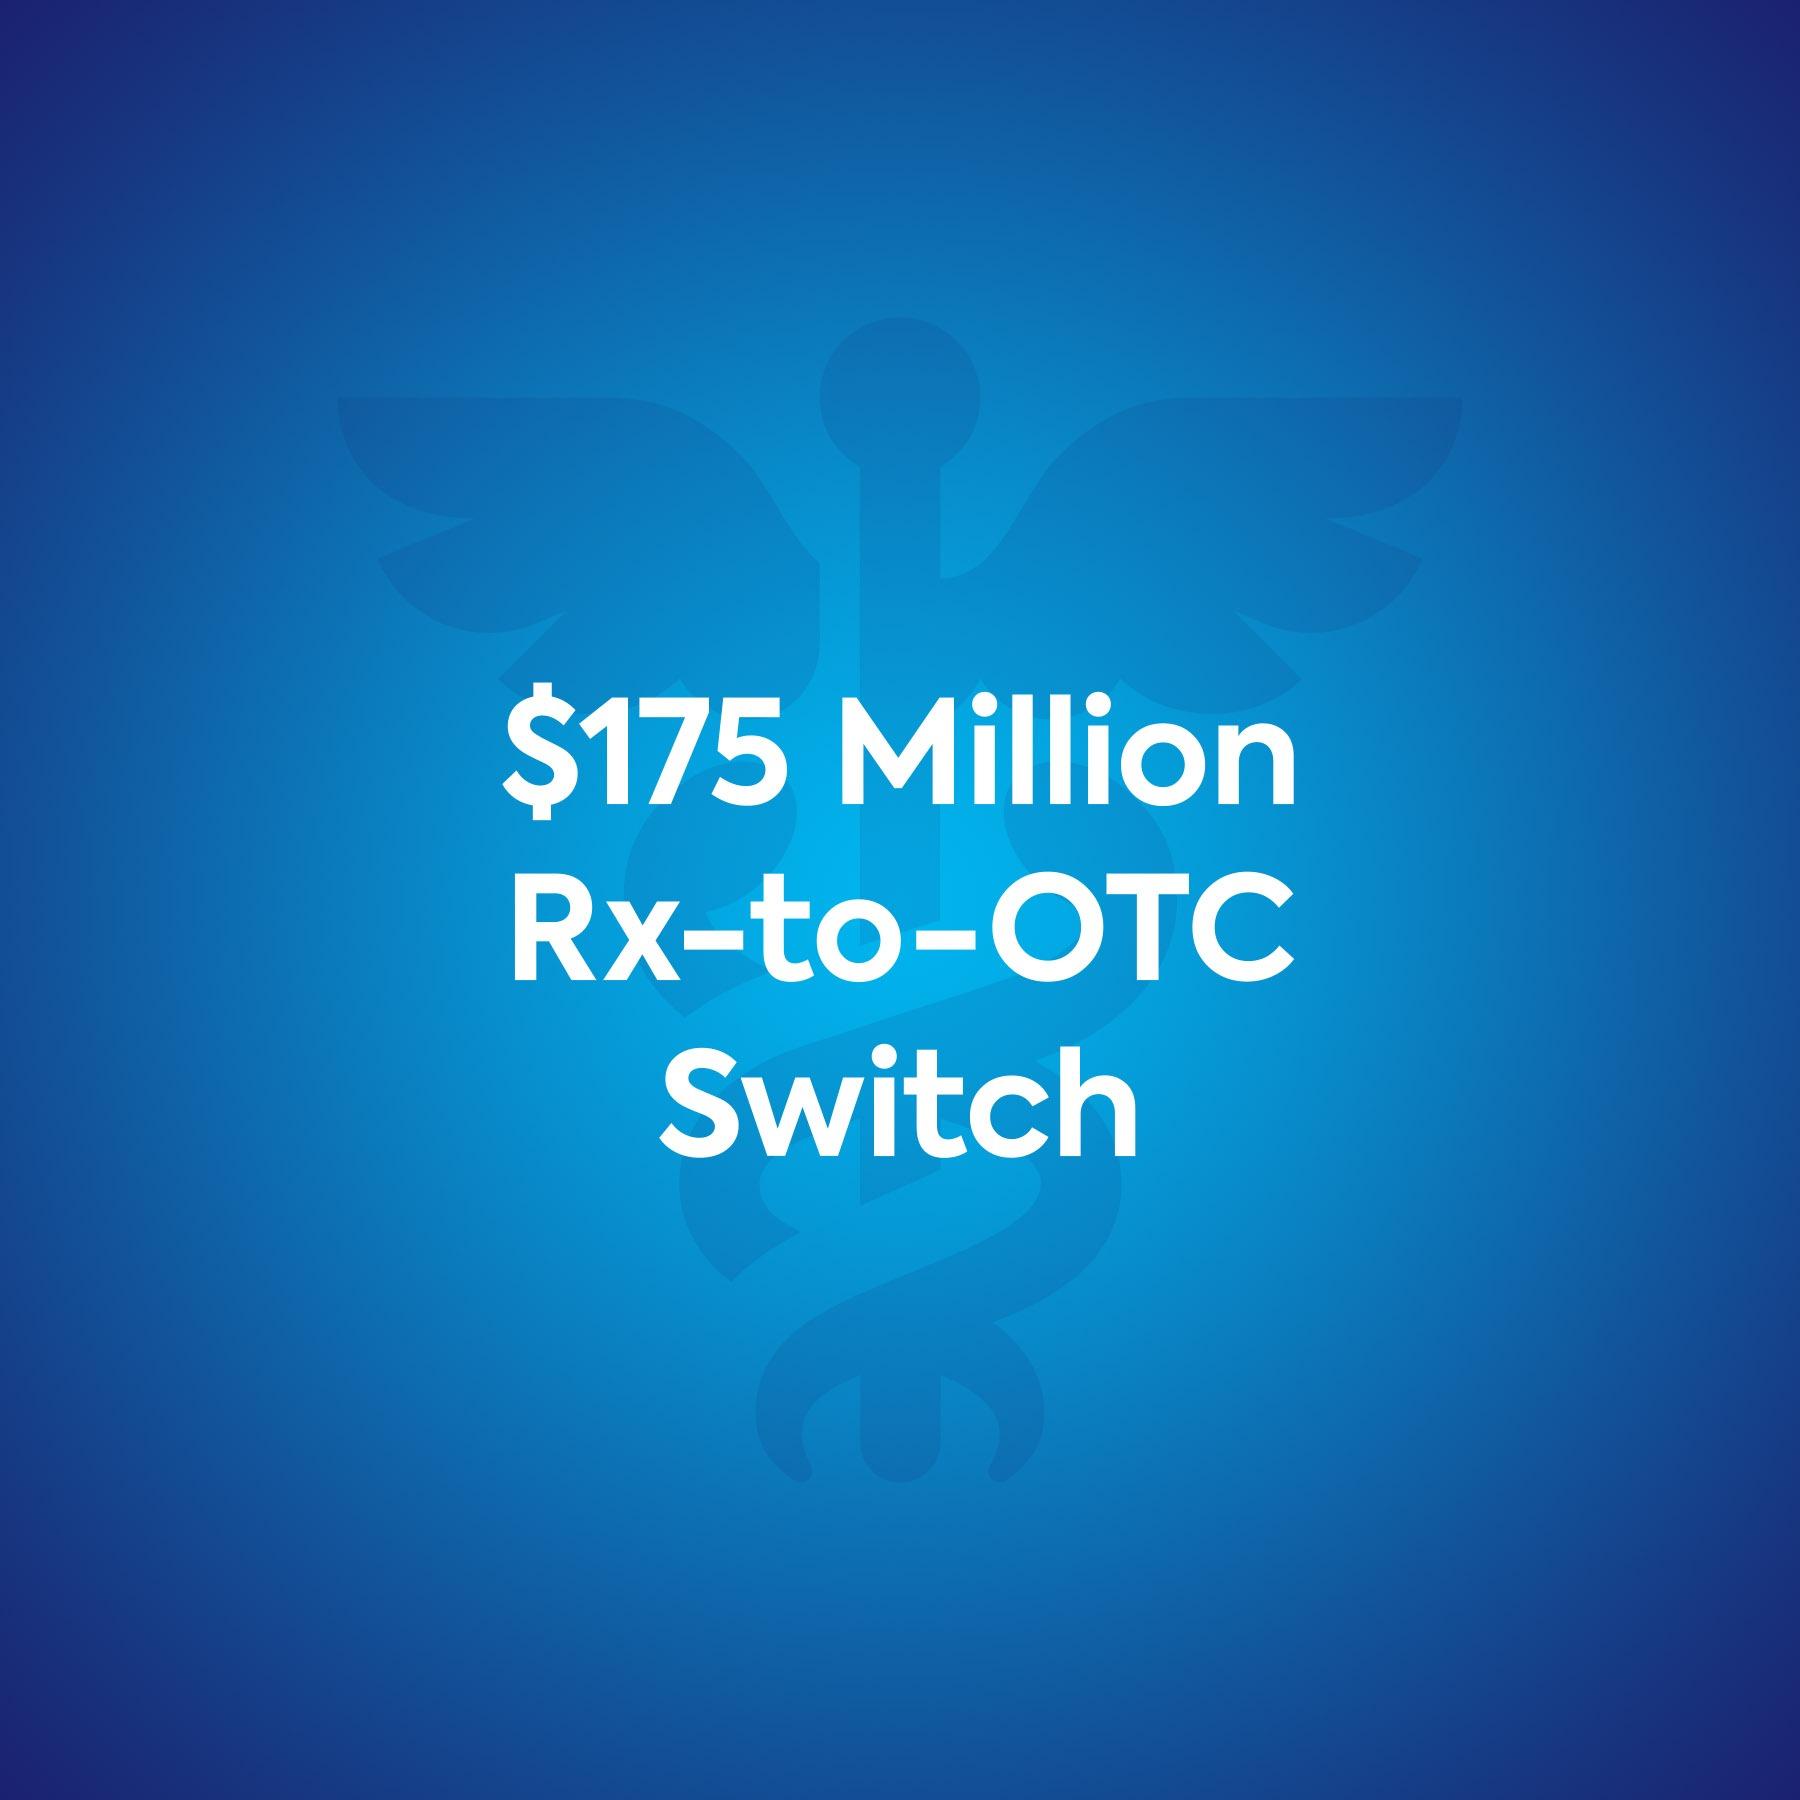 Nasacort $175 Million Rx-to-OTC Switch